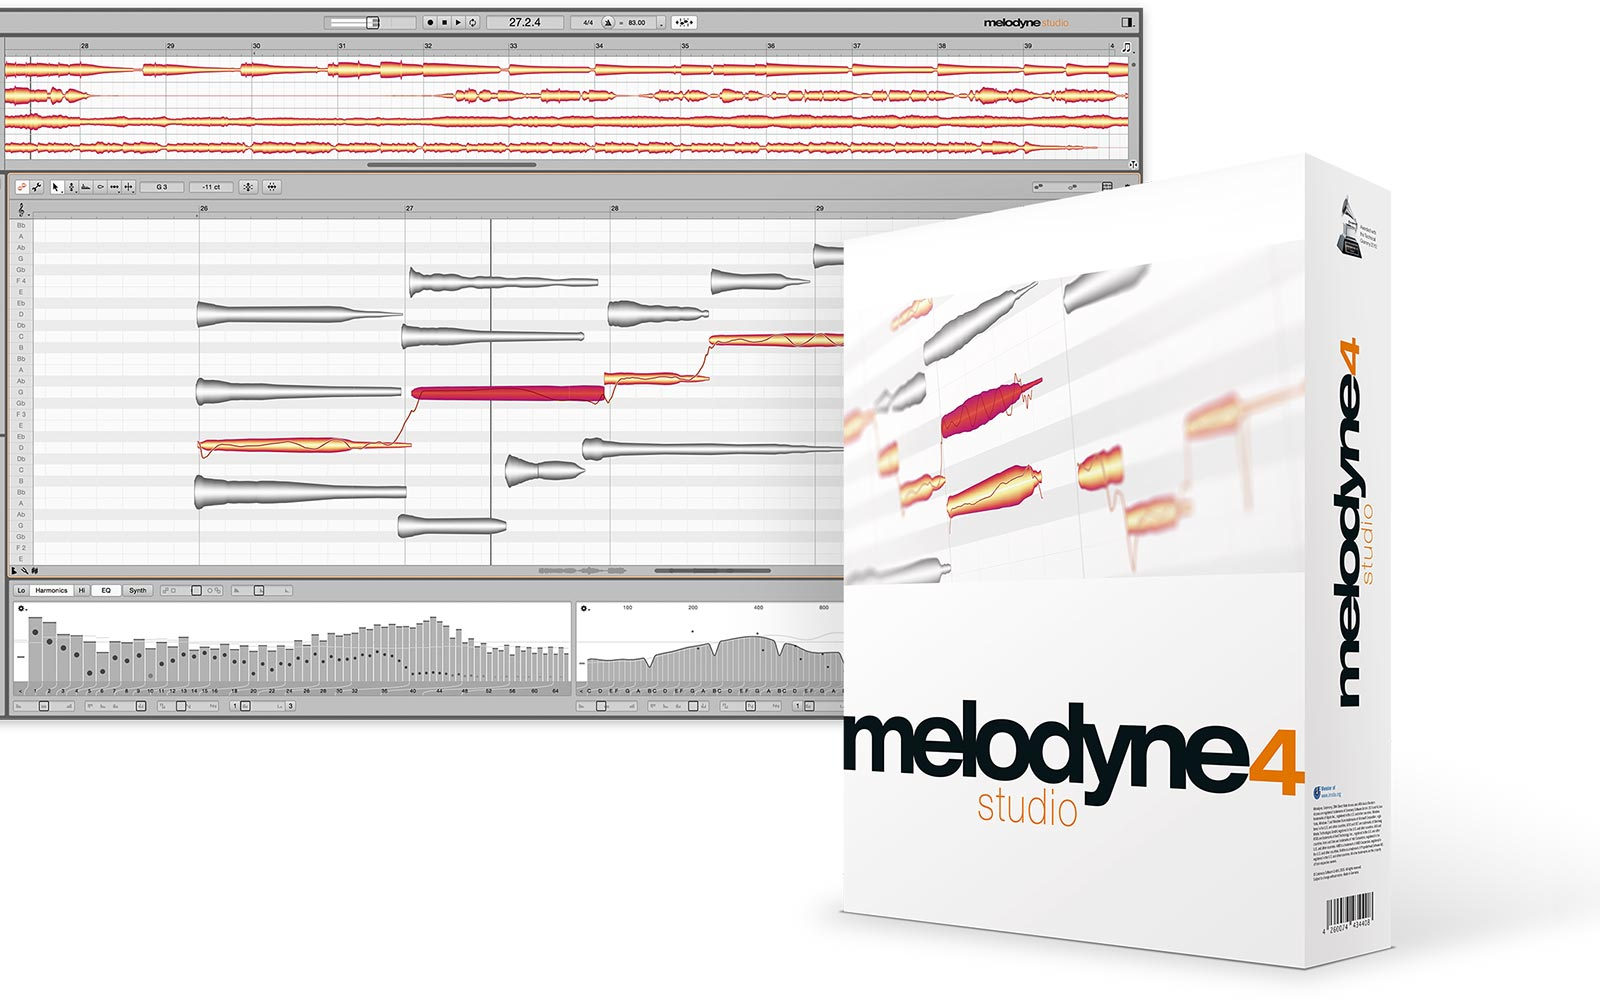 celemony-melodyne-4-studio-upgrade-von-melodyne-essential, 589.00 EUR @ music-and-more-store